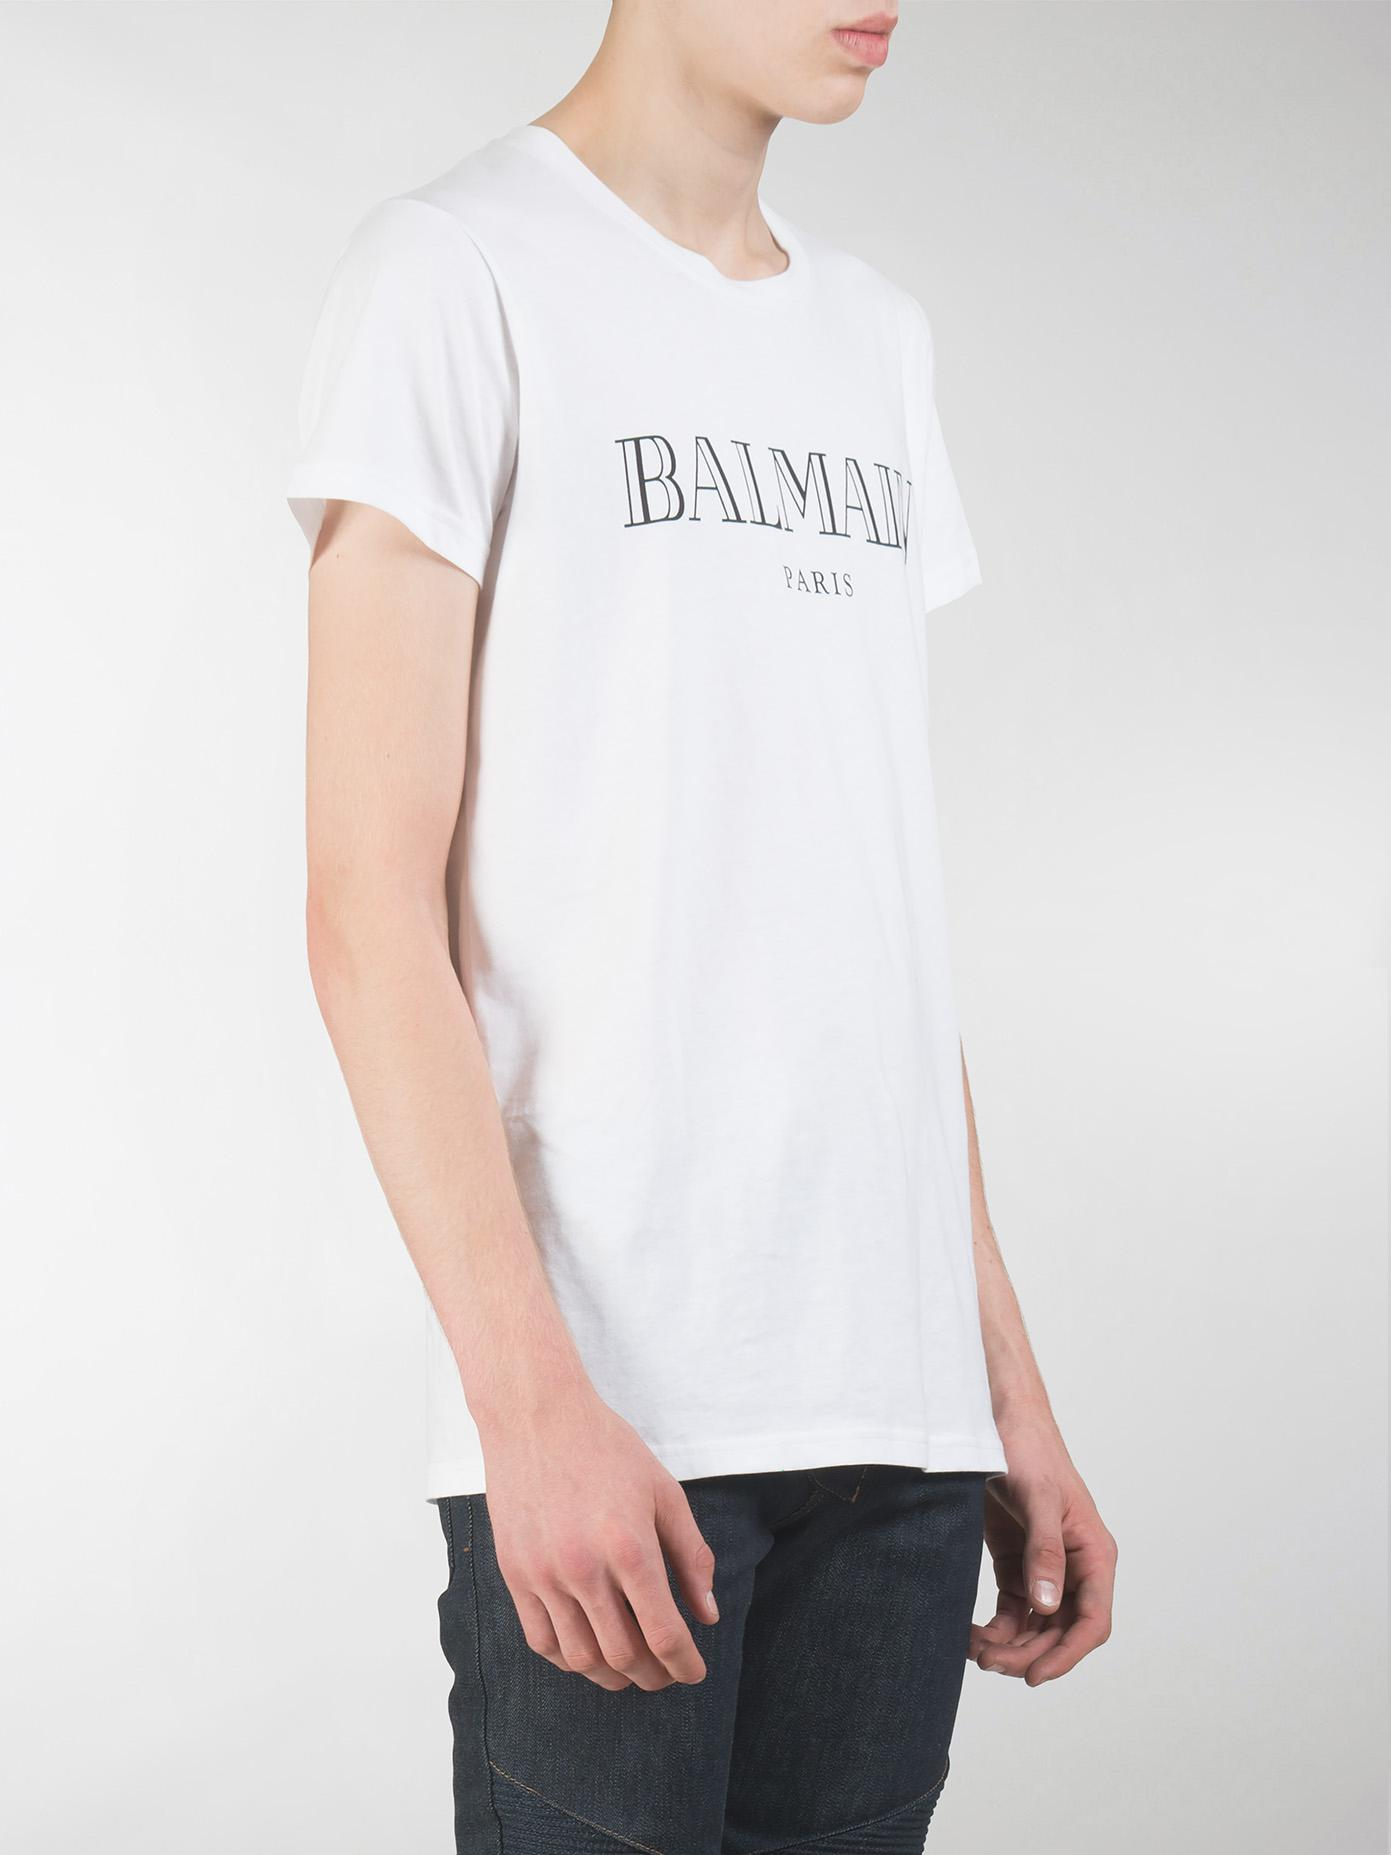 lyst balmain tshirt blanc print paris noir in white for men. Black Bedroom Furniture Sets. Home Design Ideas